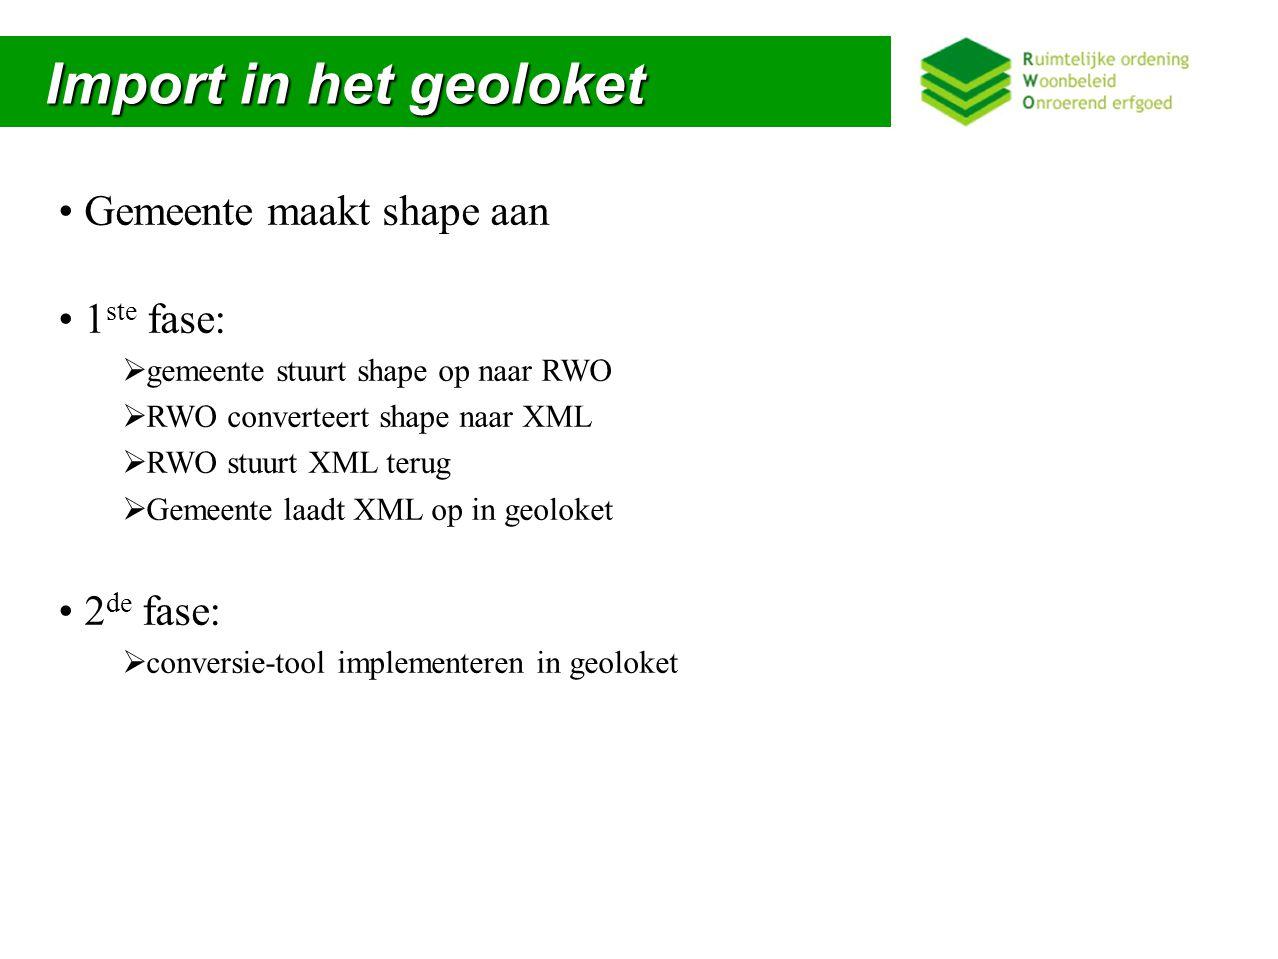 Import in het geoloket Import in het geoloket Gemeente maakt shape aan 1 ste fase:  gemeente stuurt shape op naar RWO  RWO converteert shape naar XML  RWO stuurt XML terug  Gemeente laadt XML op in geoloket 2 de fase:  conversie-tool implementeren in geoloket